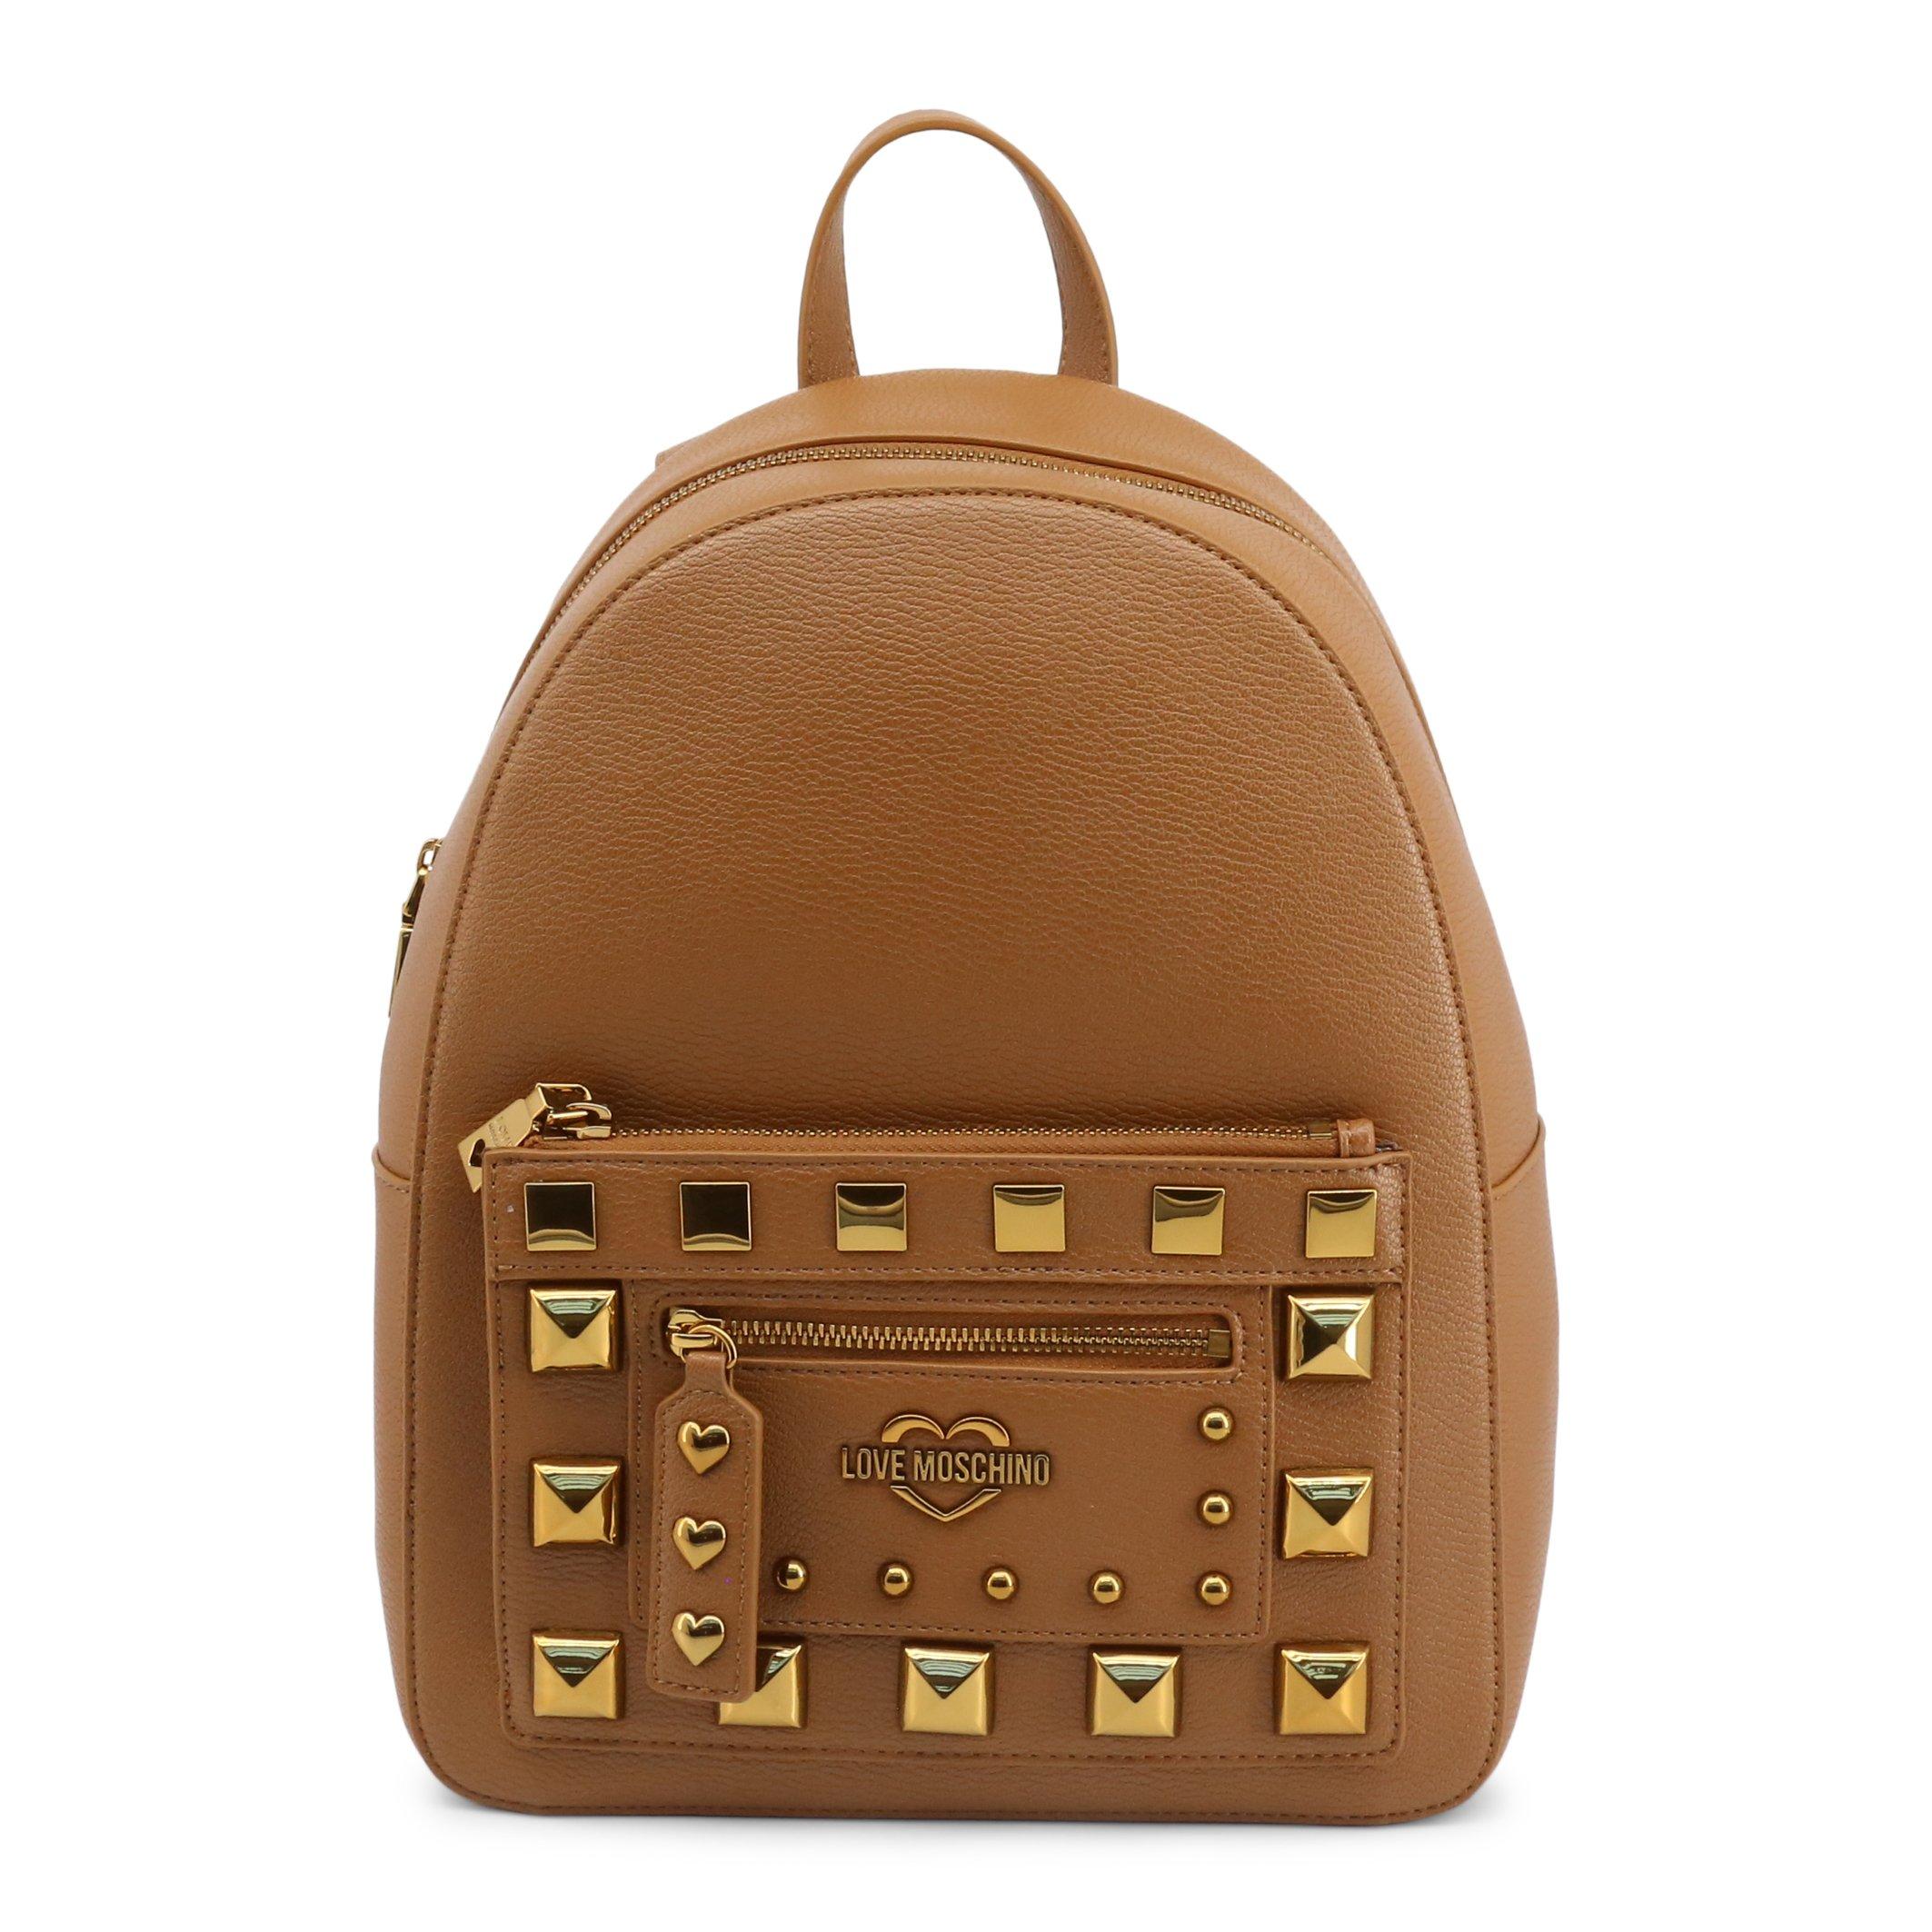 Love Moschino Women's Backpack Black JC4282PP0BKO - brown NOSIZE